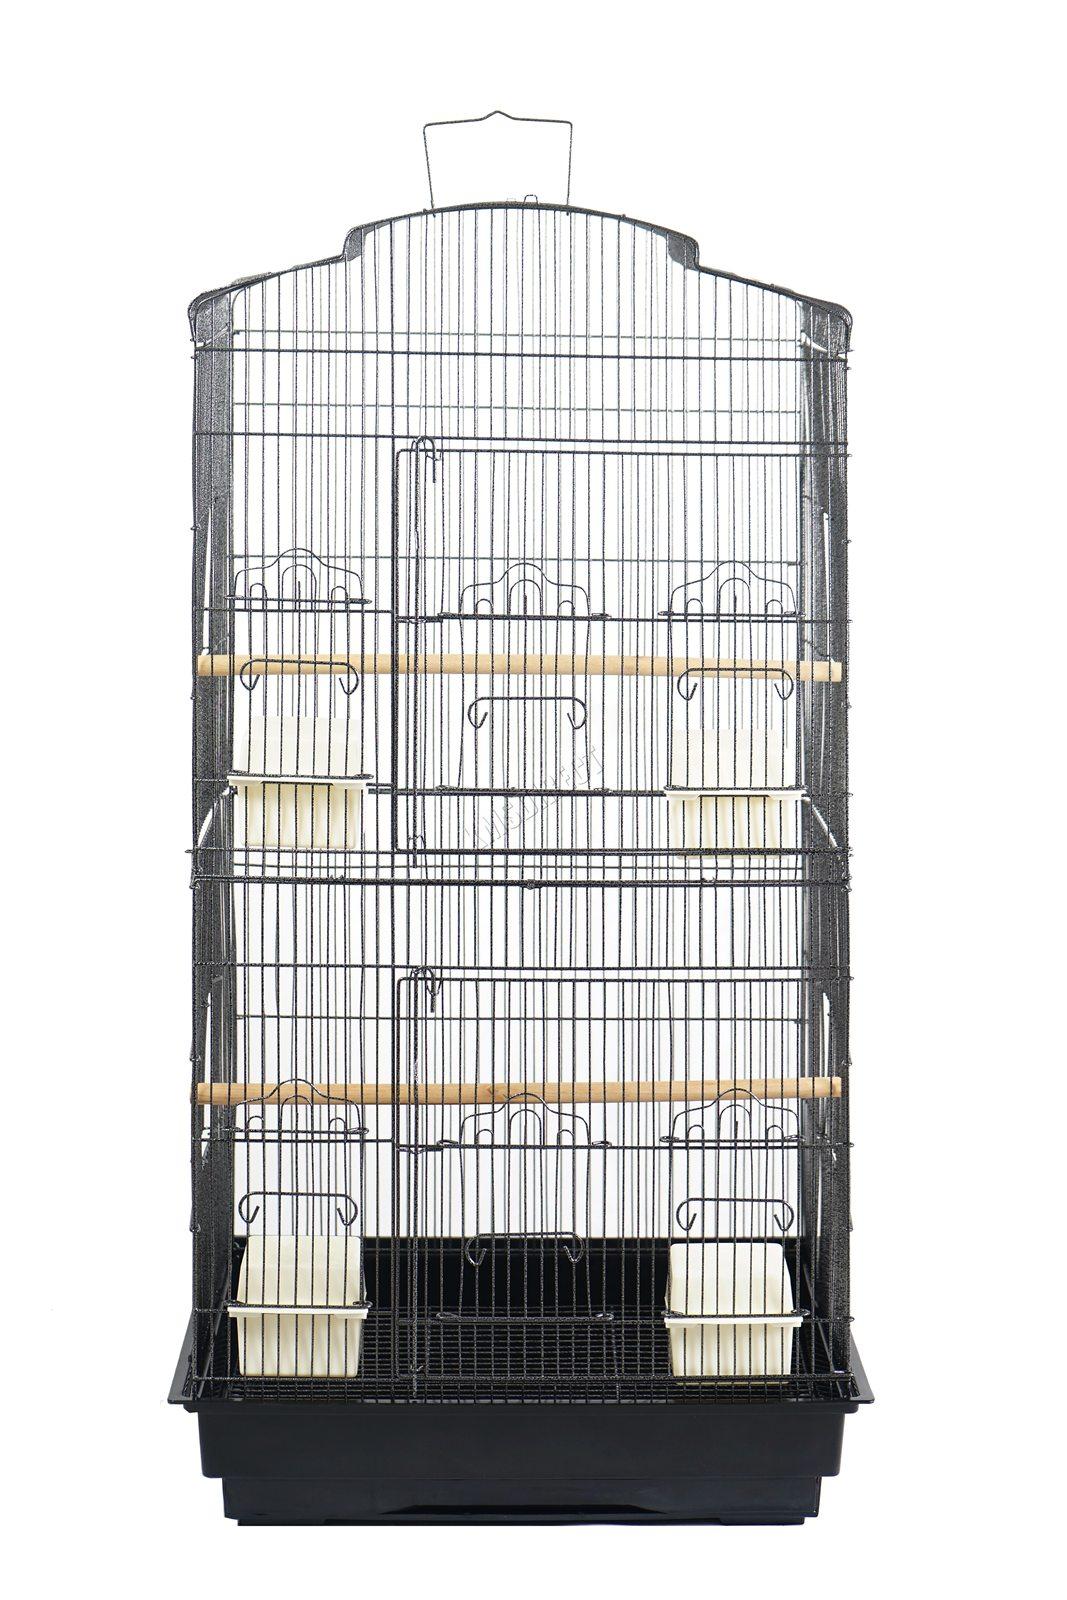 BIRD CAGE METAL MBC 05 HAMMERED SILVER KMSWM02 - Foxhunter Grande Metal Jaula con Soporte Pajarera Loro Periquito Canario Cacatua